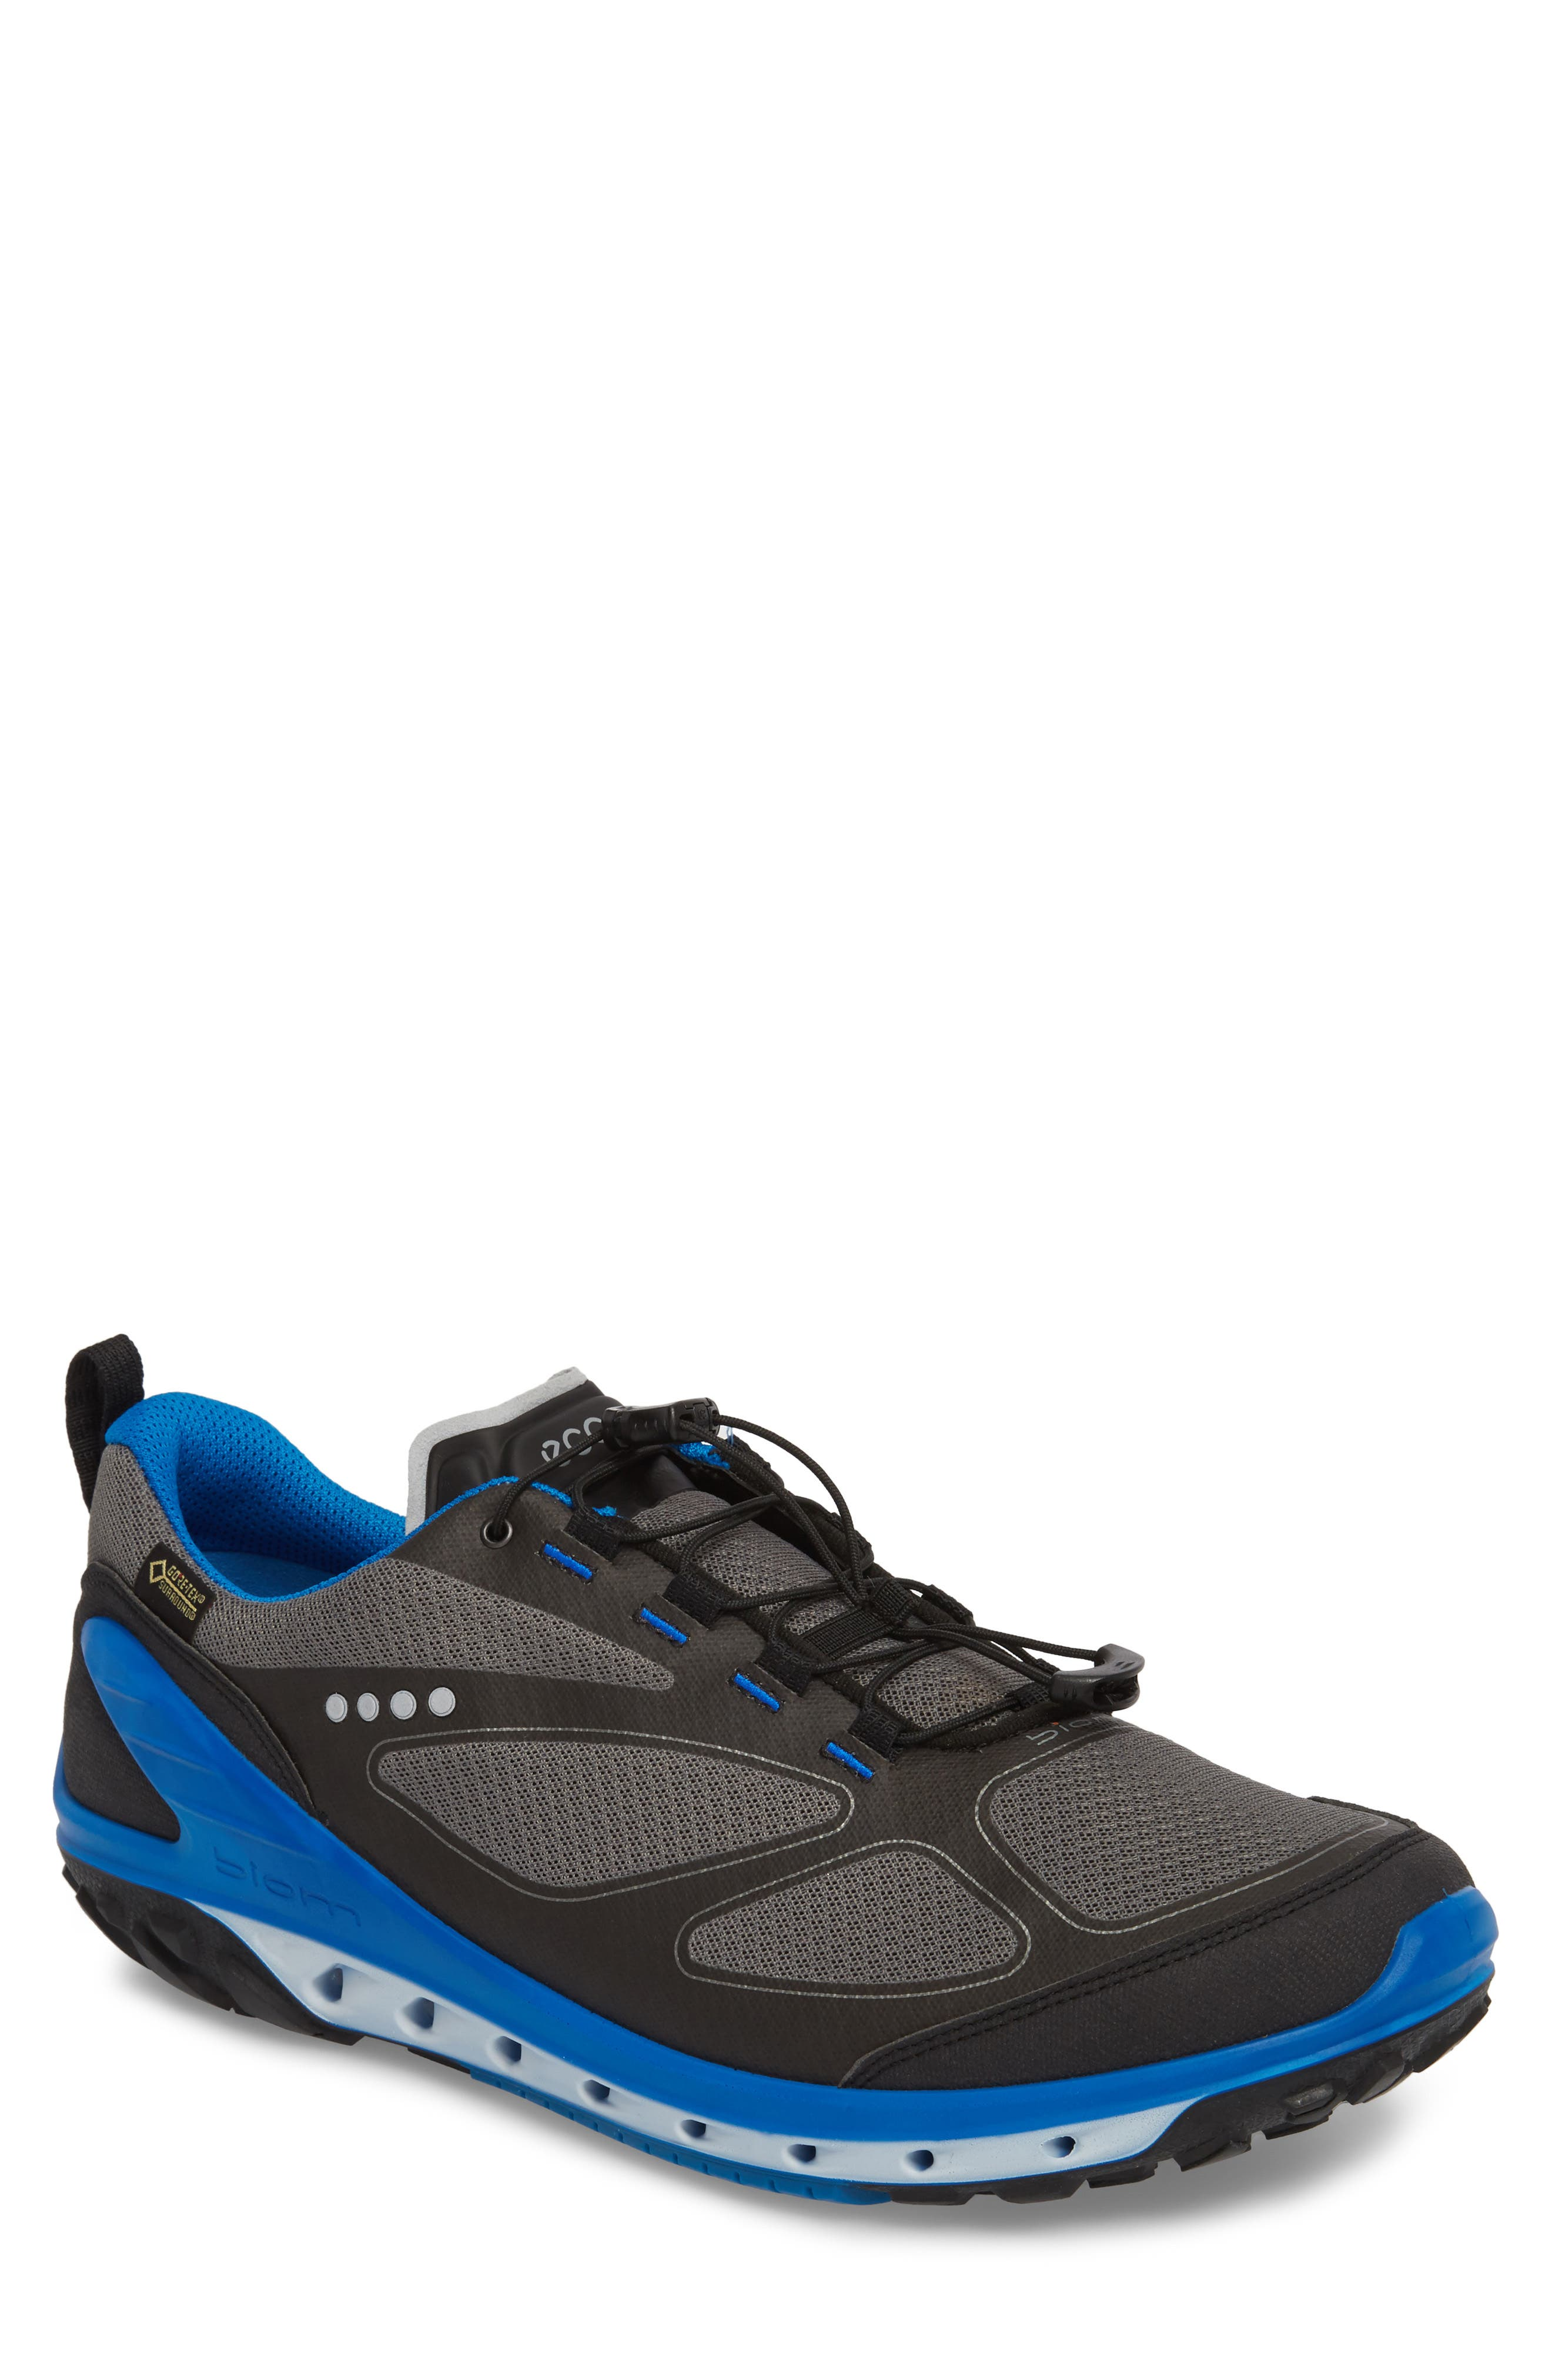 BIOM Venture GTX Sneaker,                             Main thumbnail 1, color,                             062